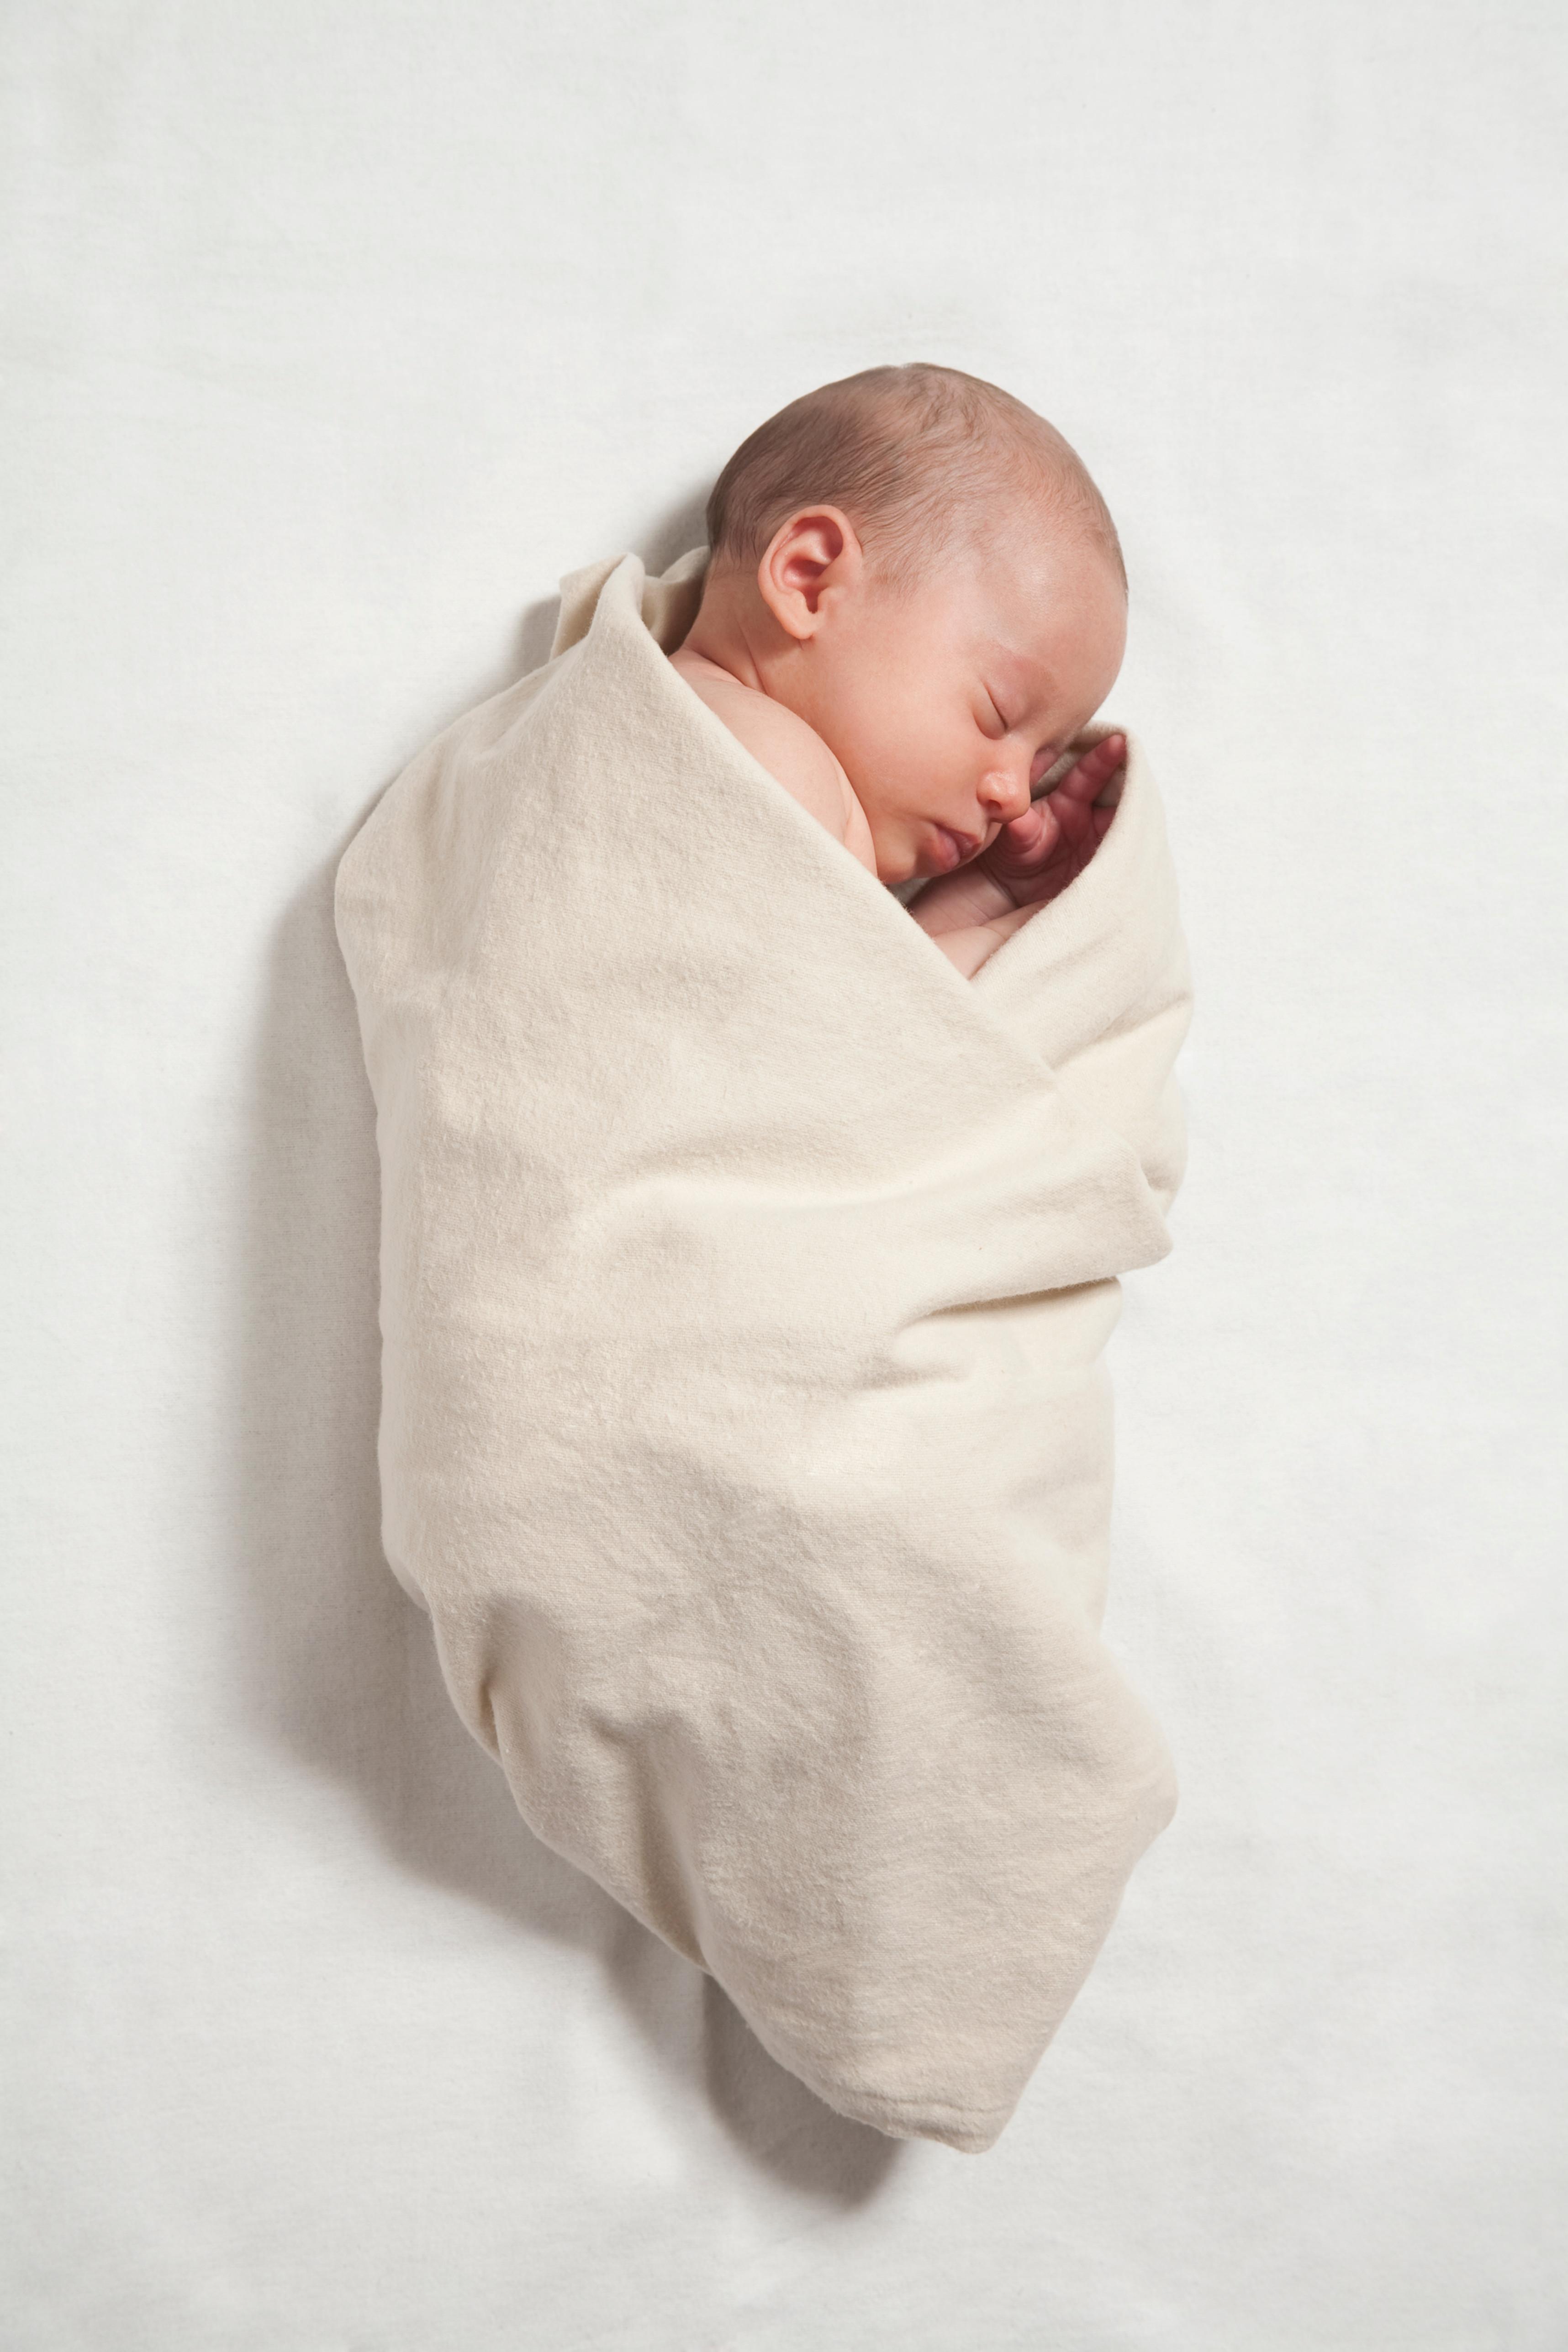 Newborn Sleep Package